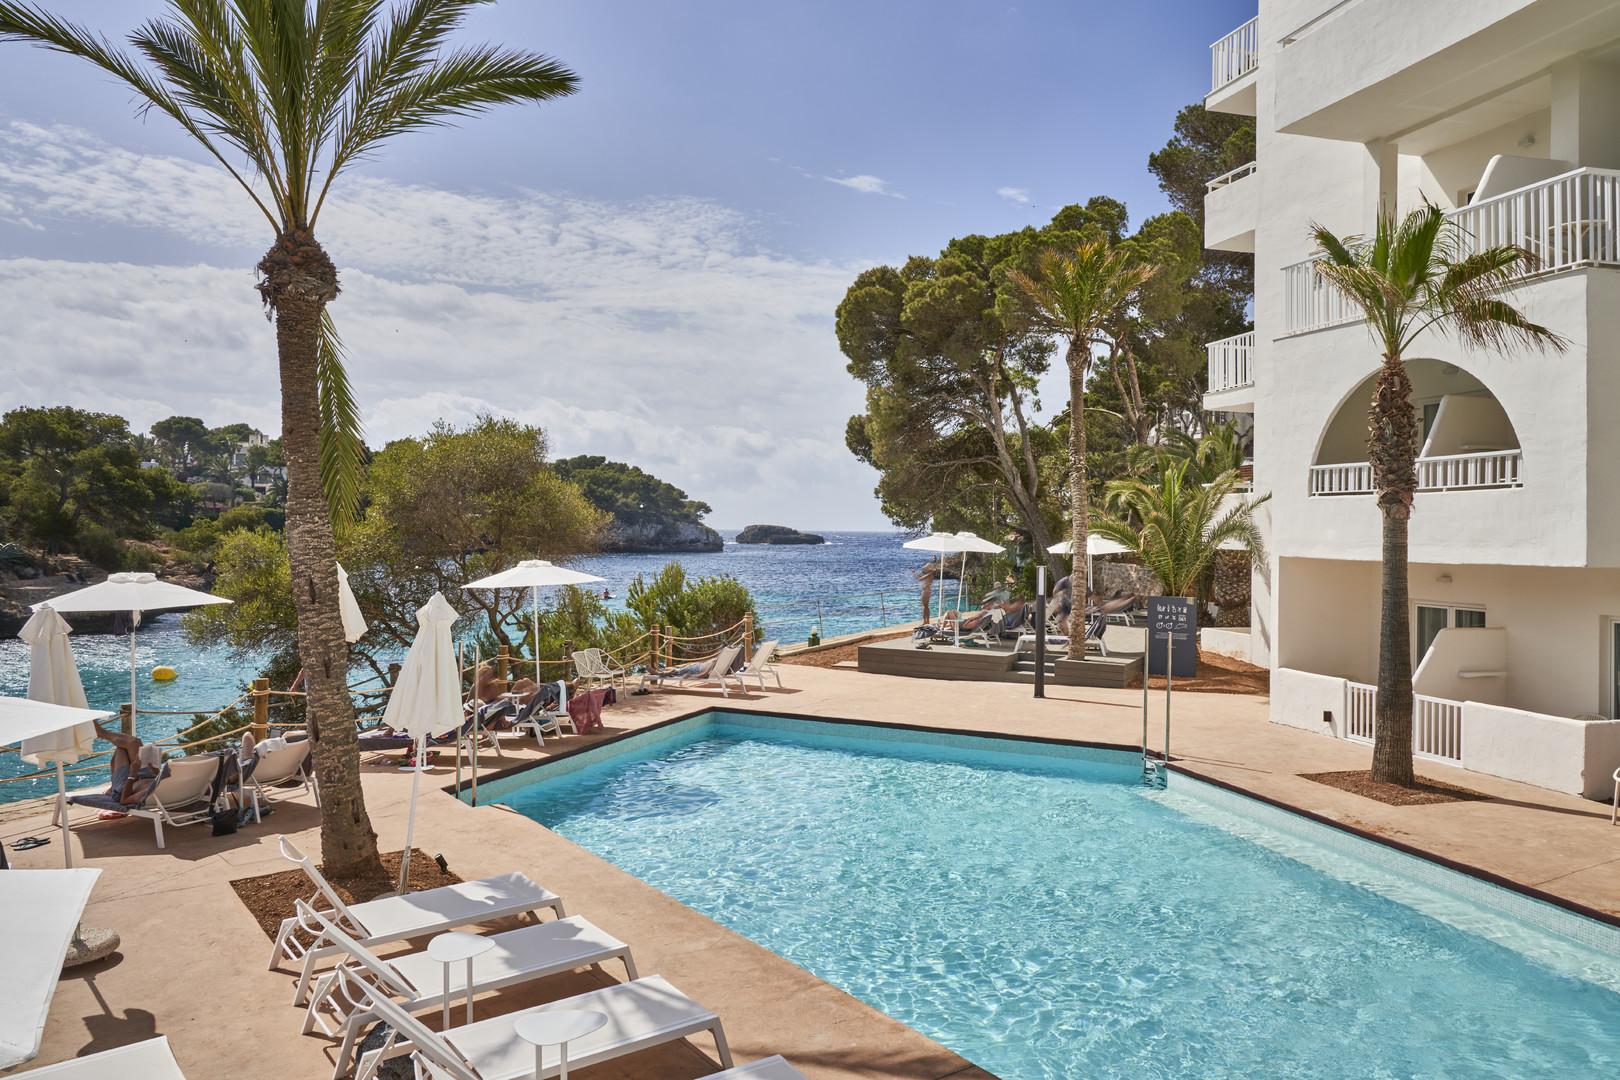 Hotel Barcelo Ponent Playa #3